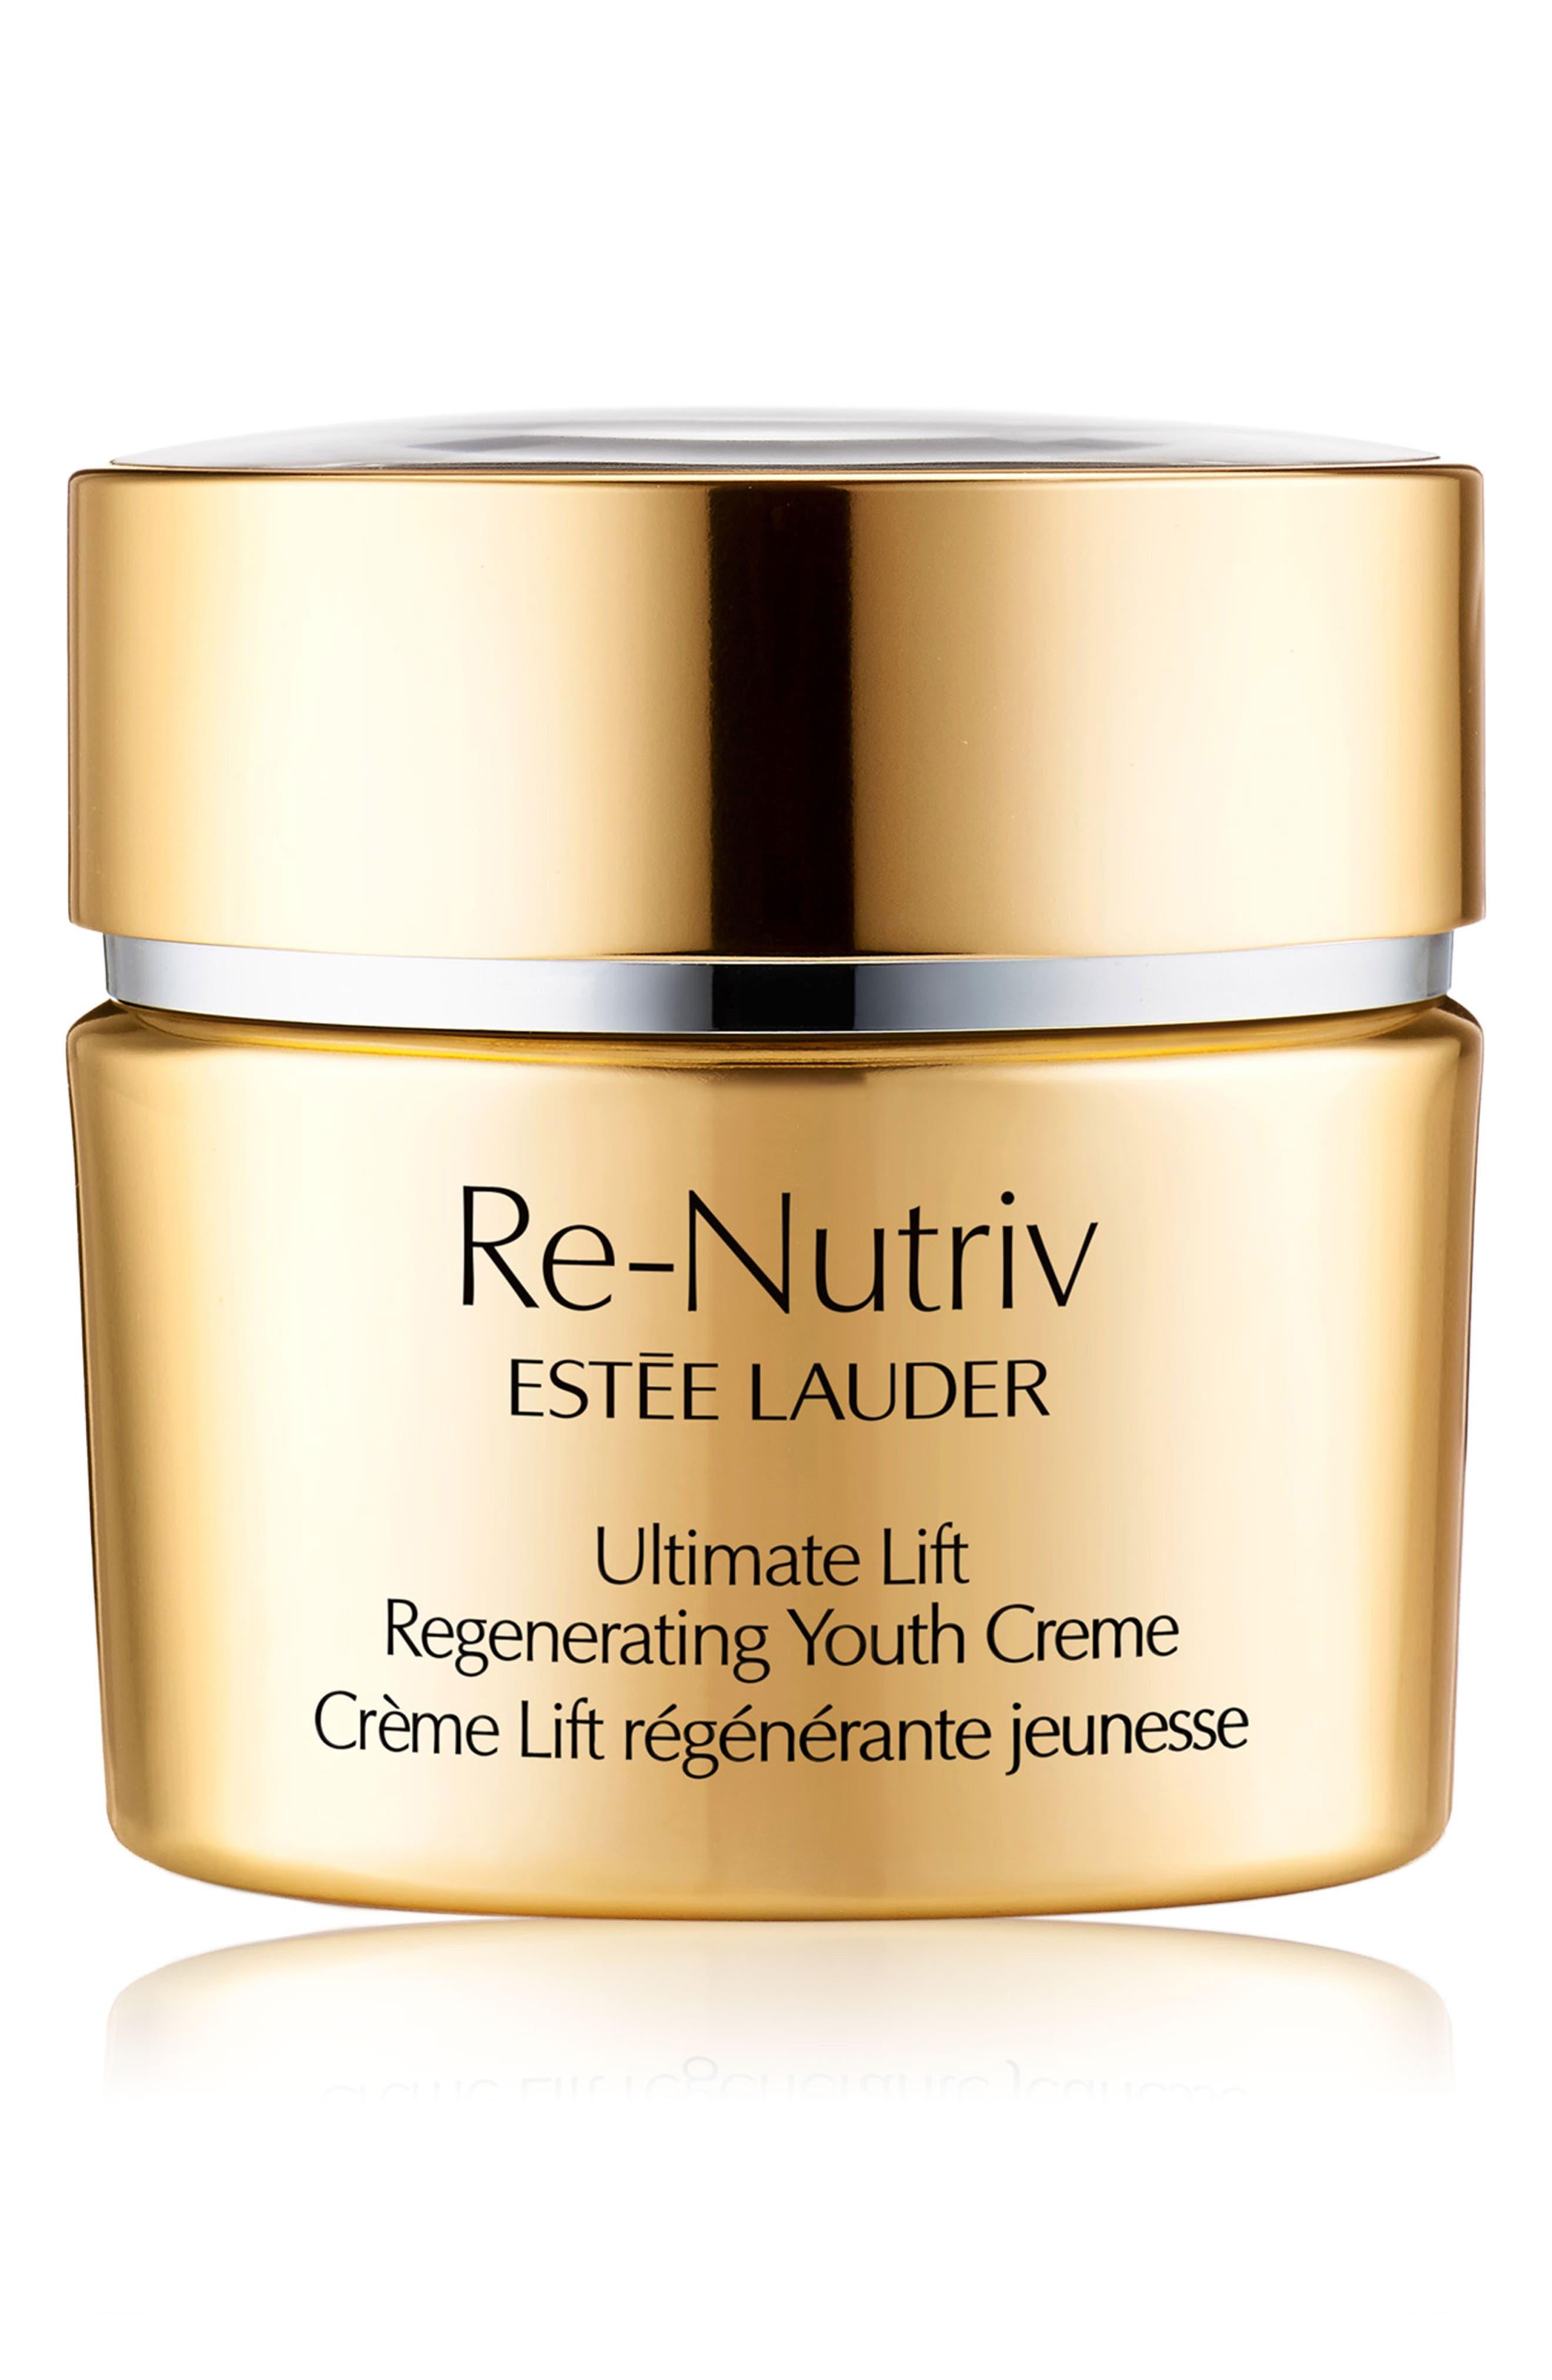 Re-Nutriv Ultimate Lift Regenerating Youth Crème | Nordstrom